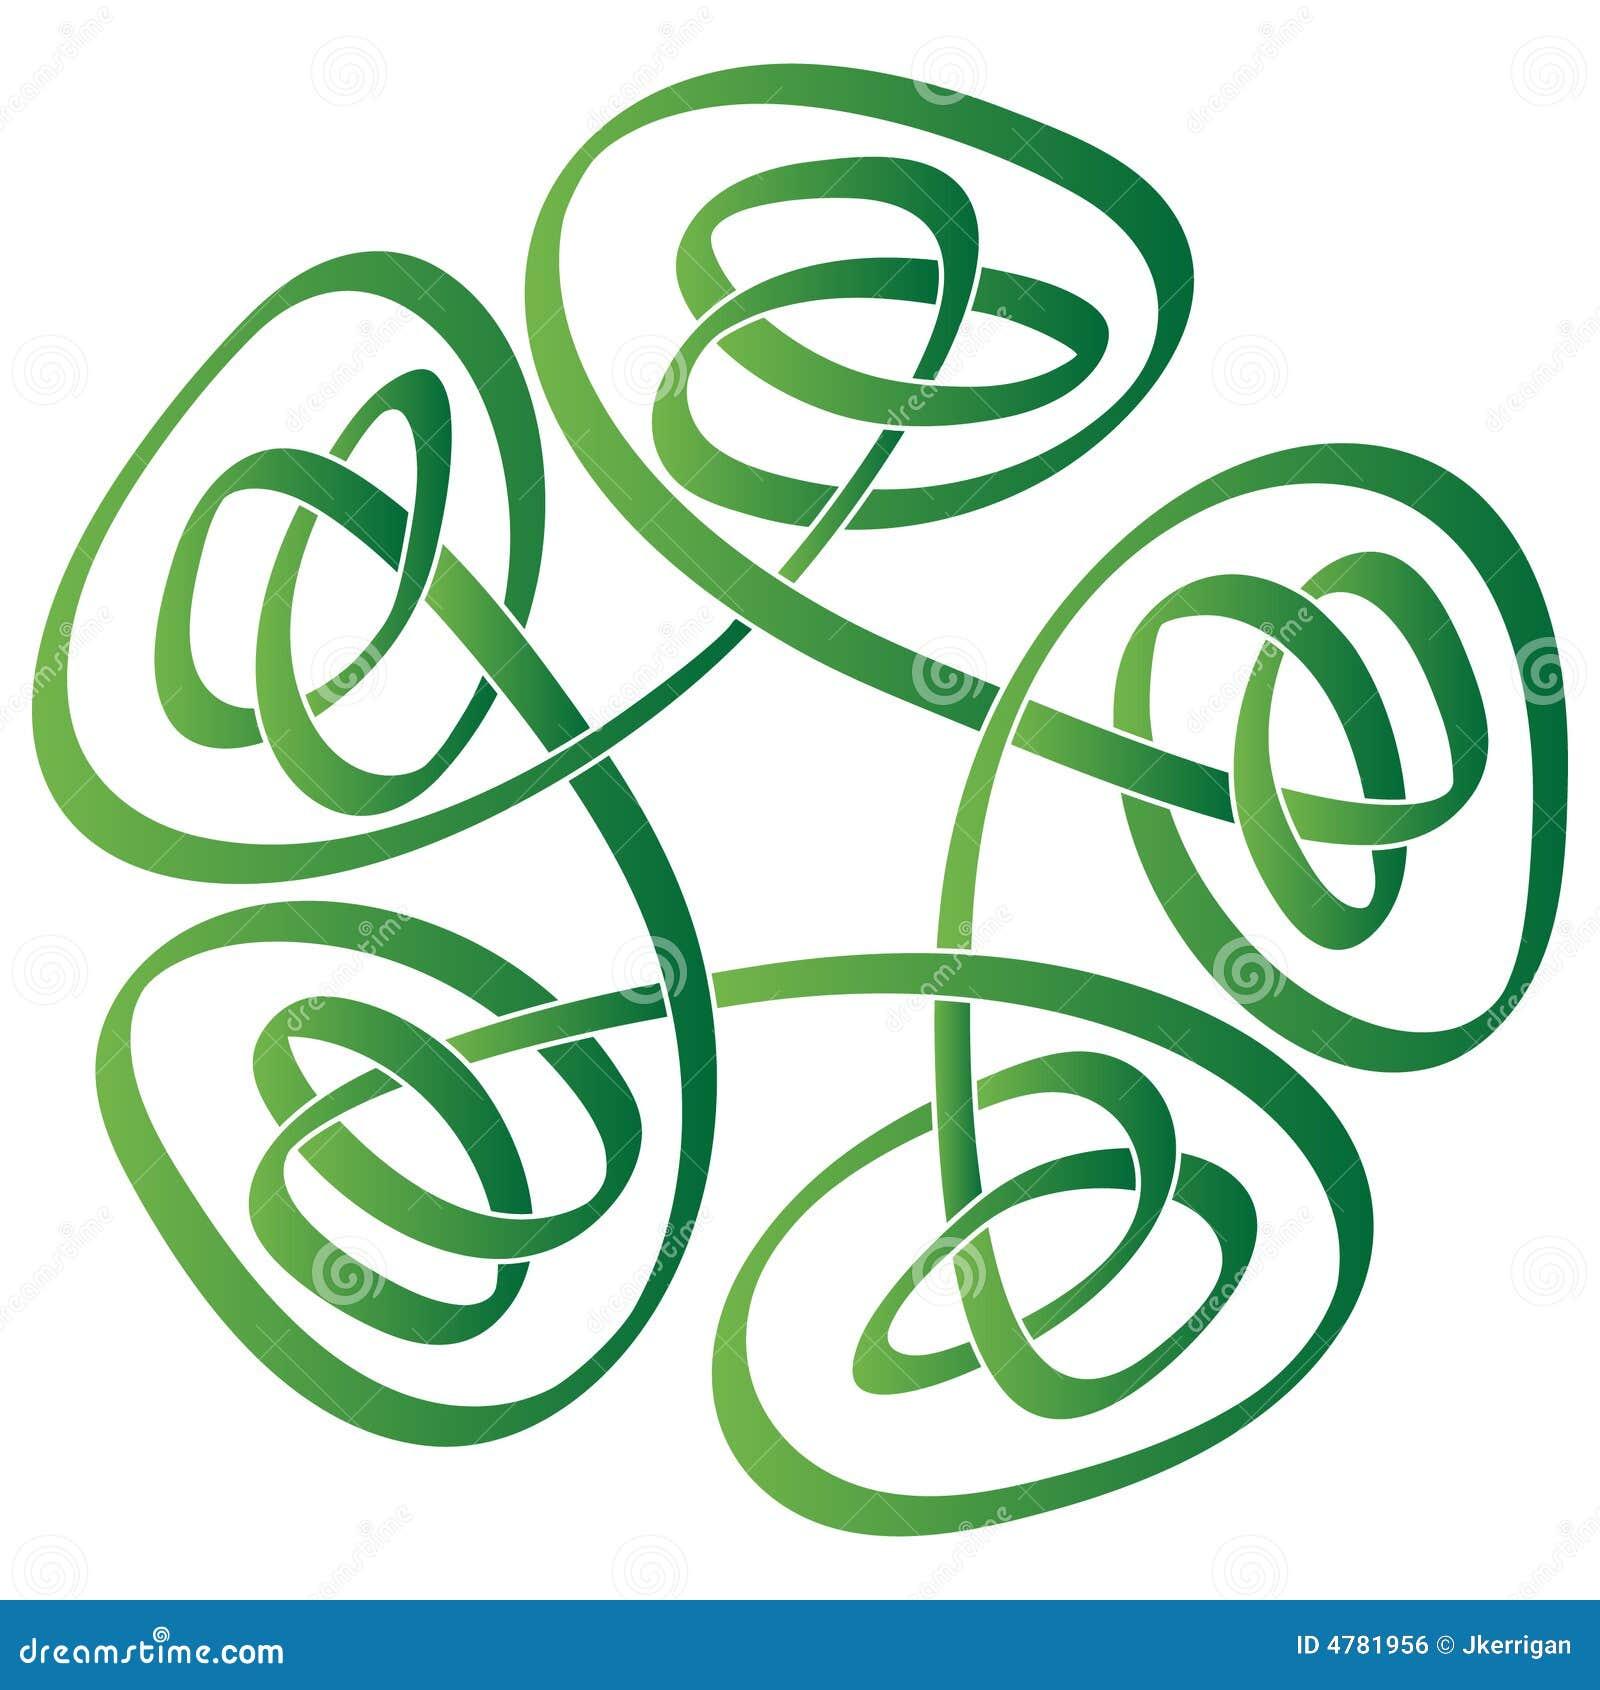 Noeud celtique